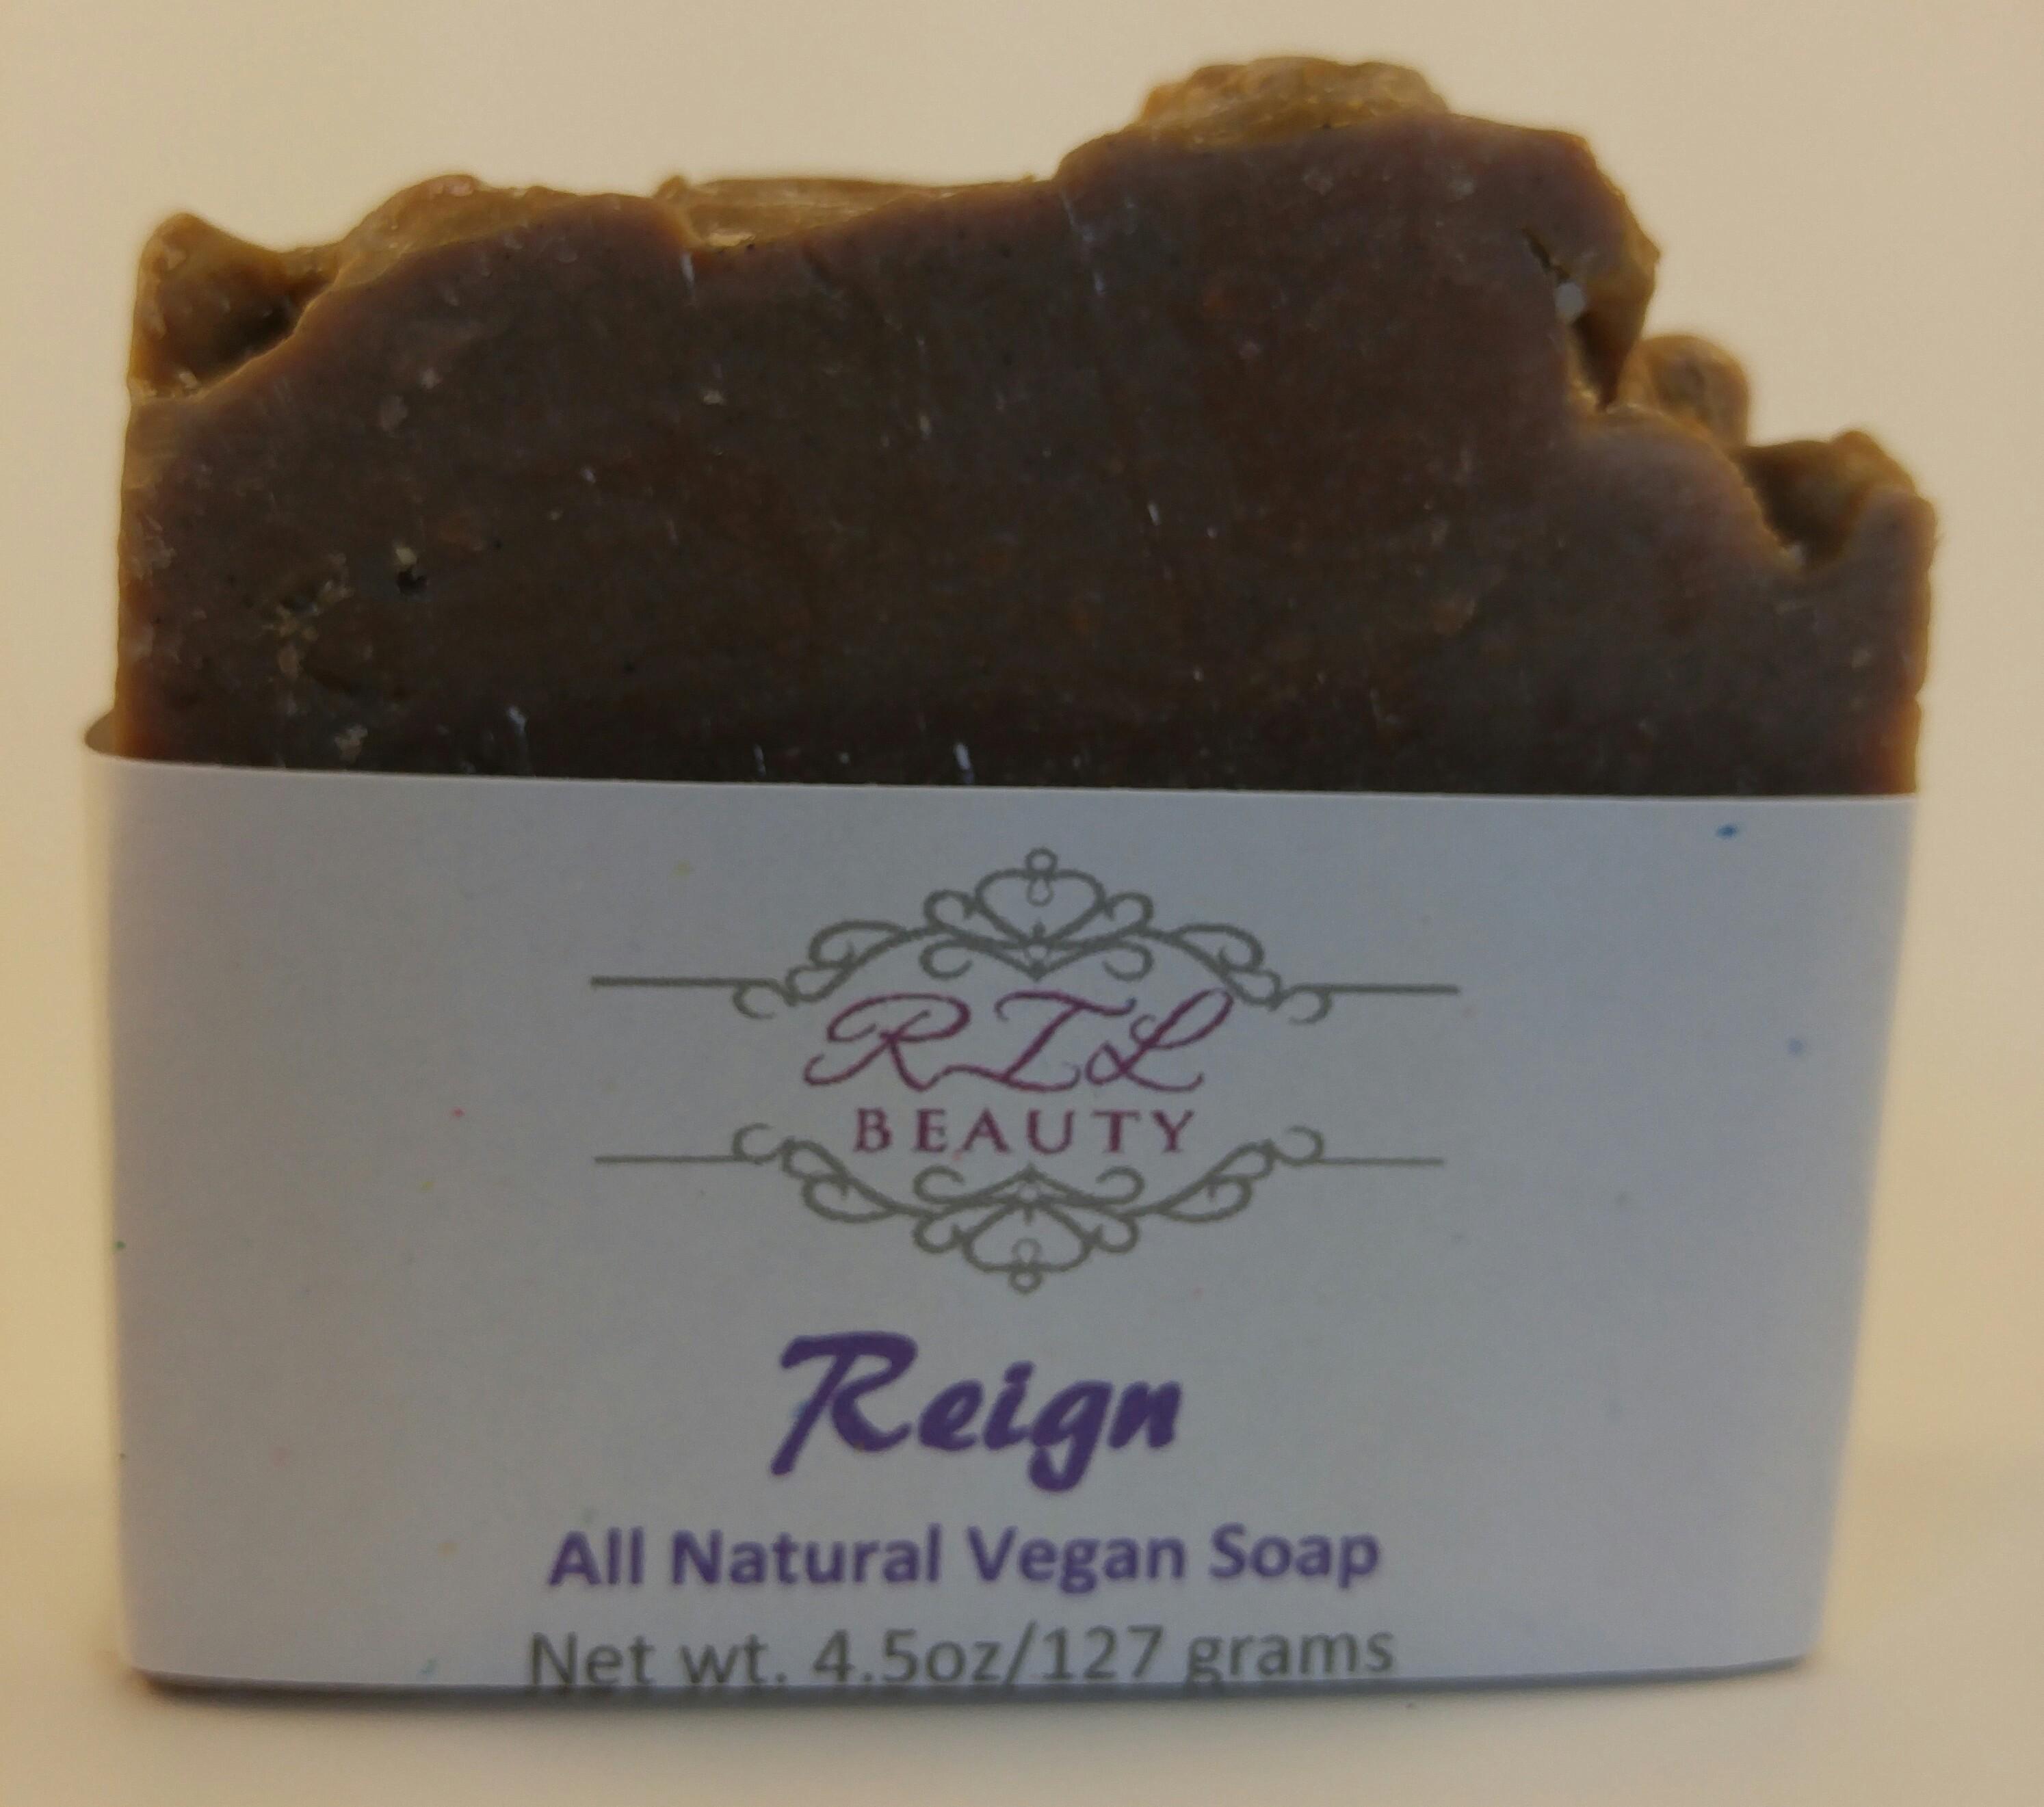 Reign Vegan Soap